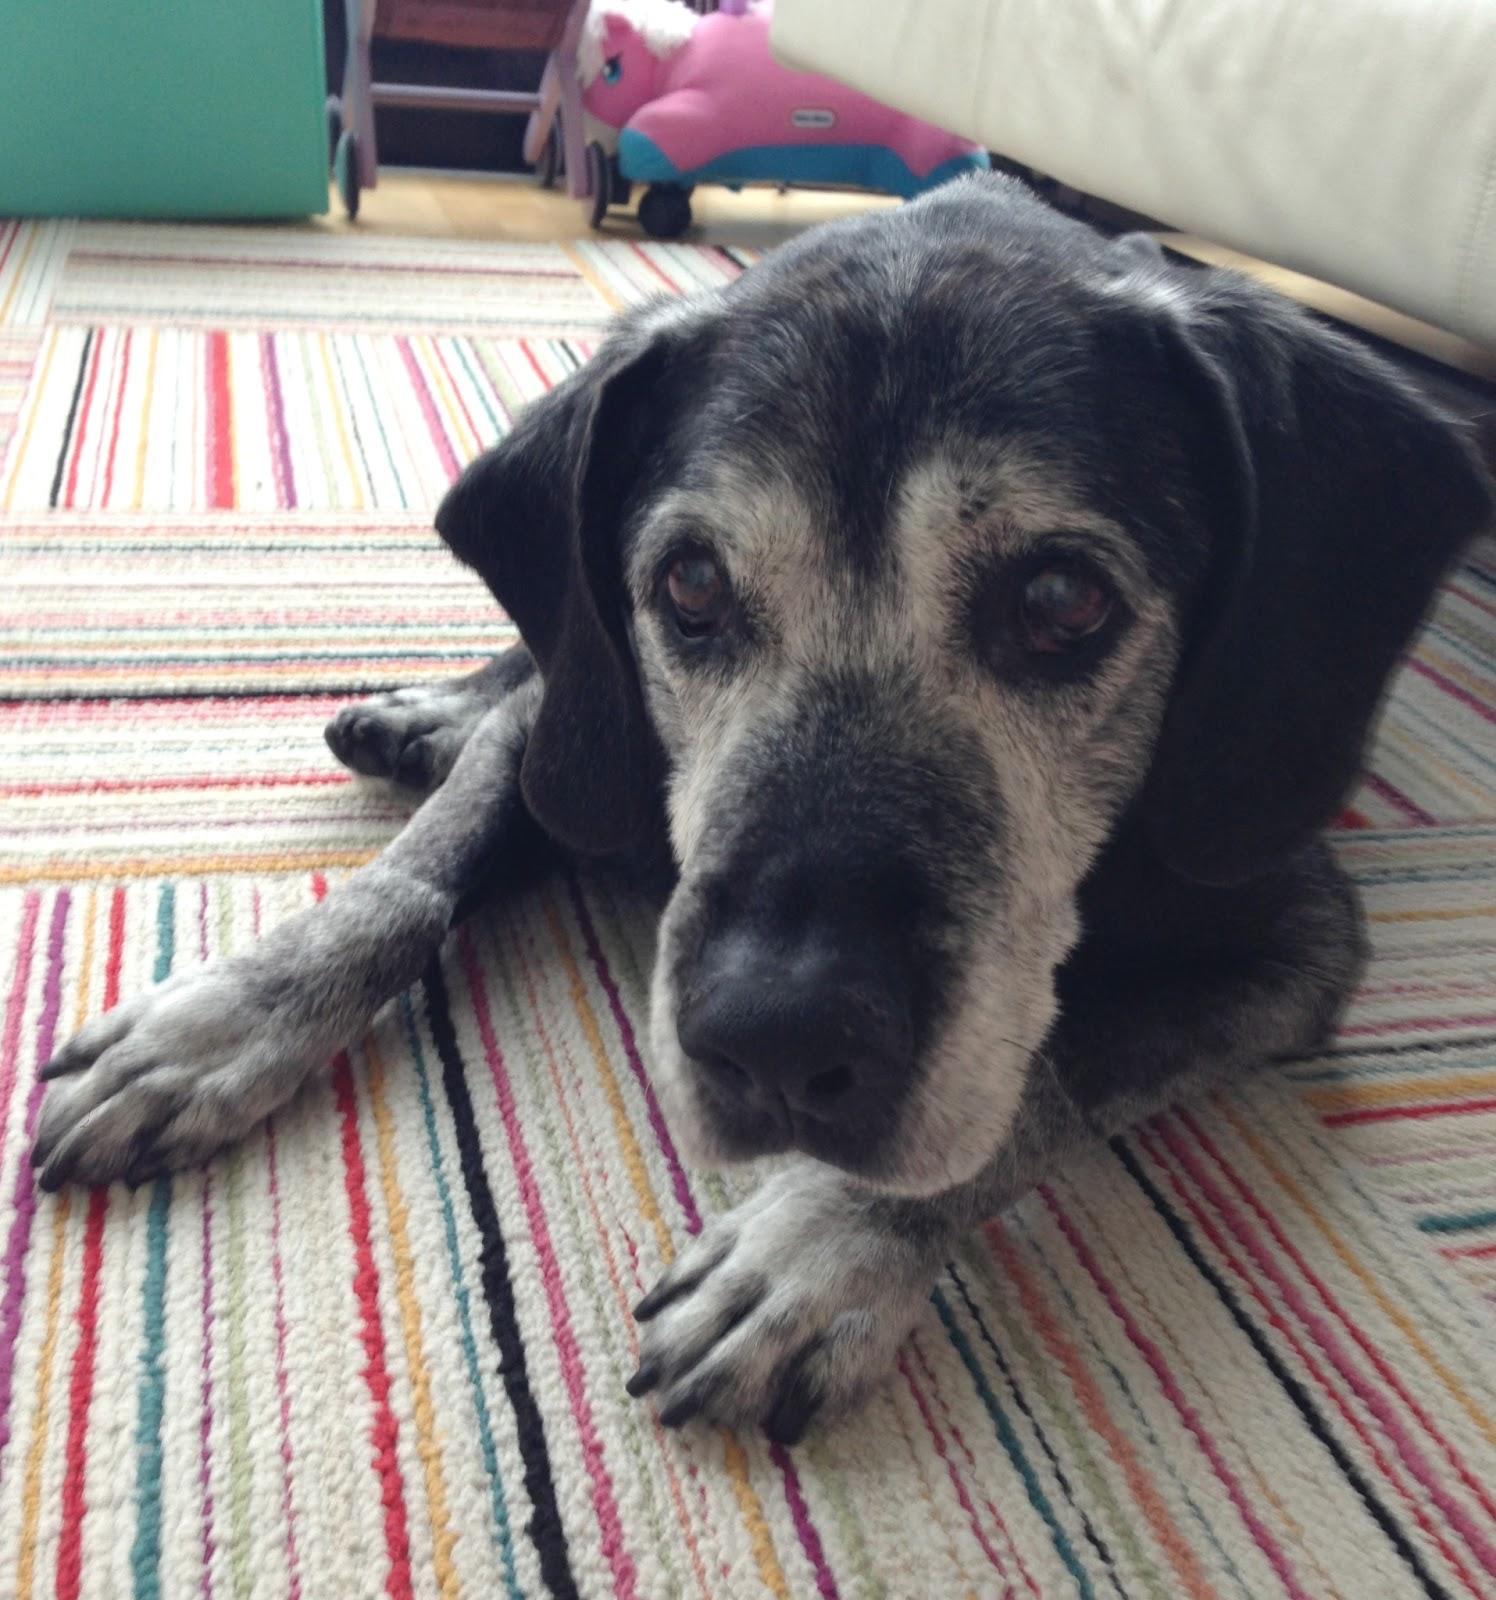 How To Treat Vestibular Disease In Dogs